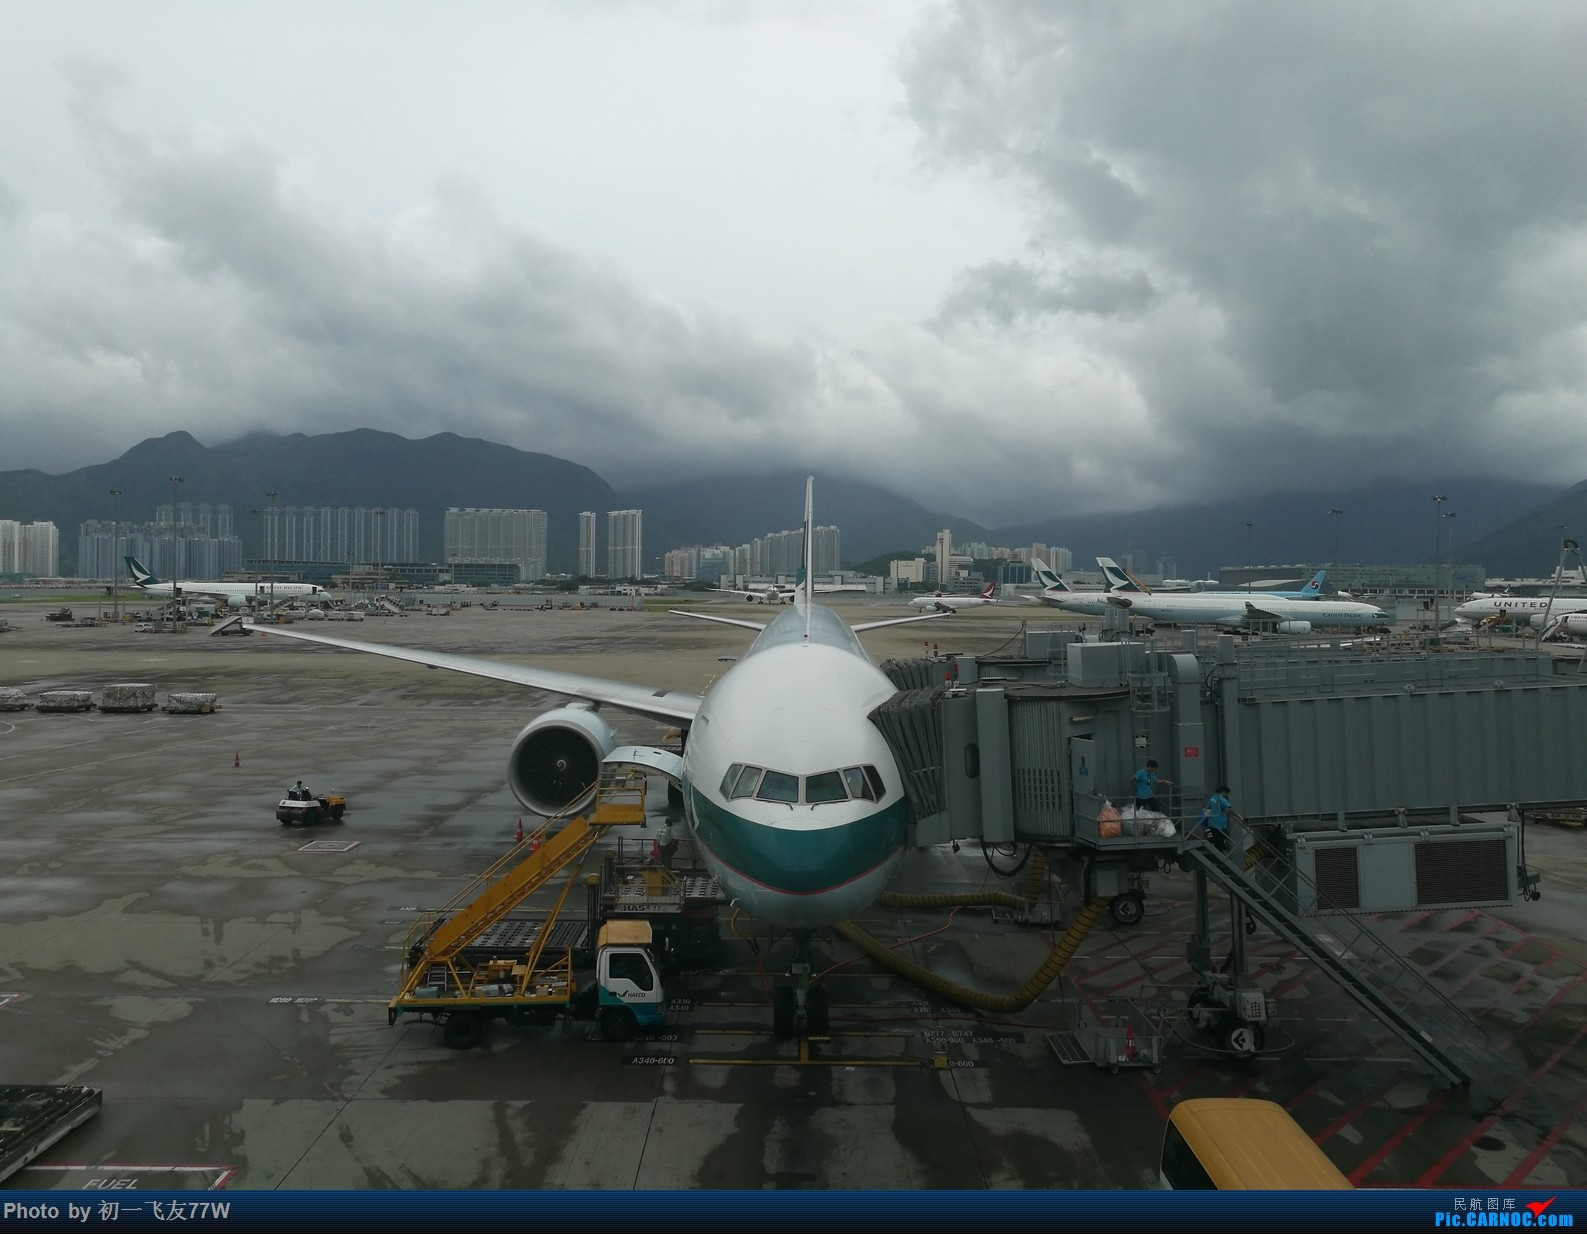 Re:[原创]香港到蒙特利尔,中转多伦多 B777-300